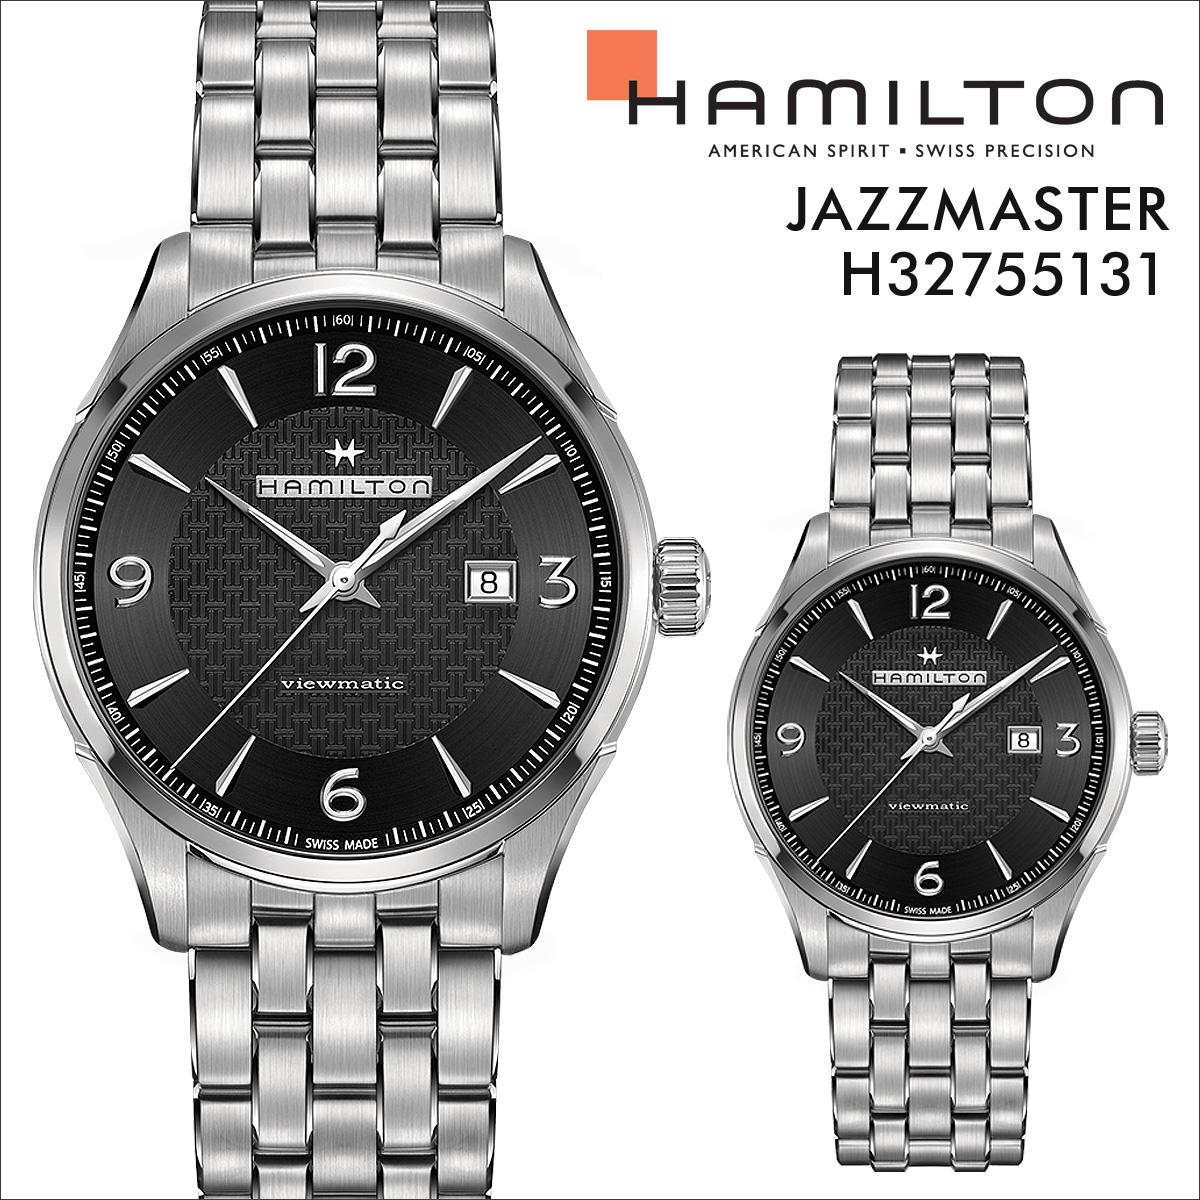 HAMILTON ハミルトン 腕時計 ジャズマスター メンズ 時計 44mm JAZZMASTER VIEWMATIC AUTO H32755131 シルバー 防水 [ あす楽対象外 ]